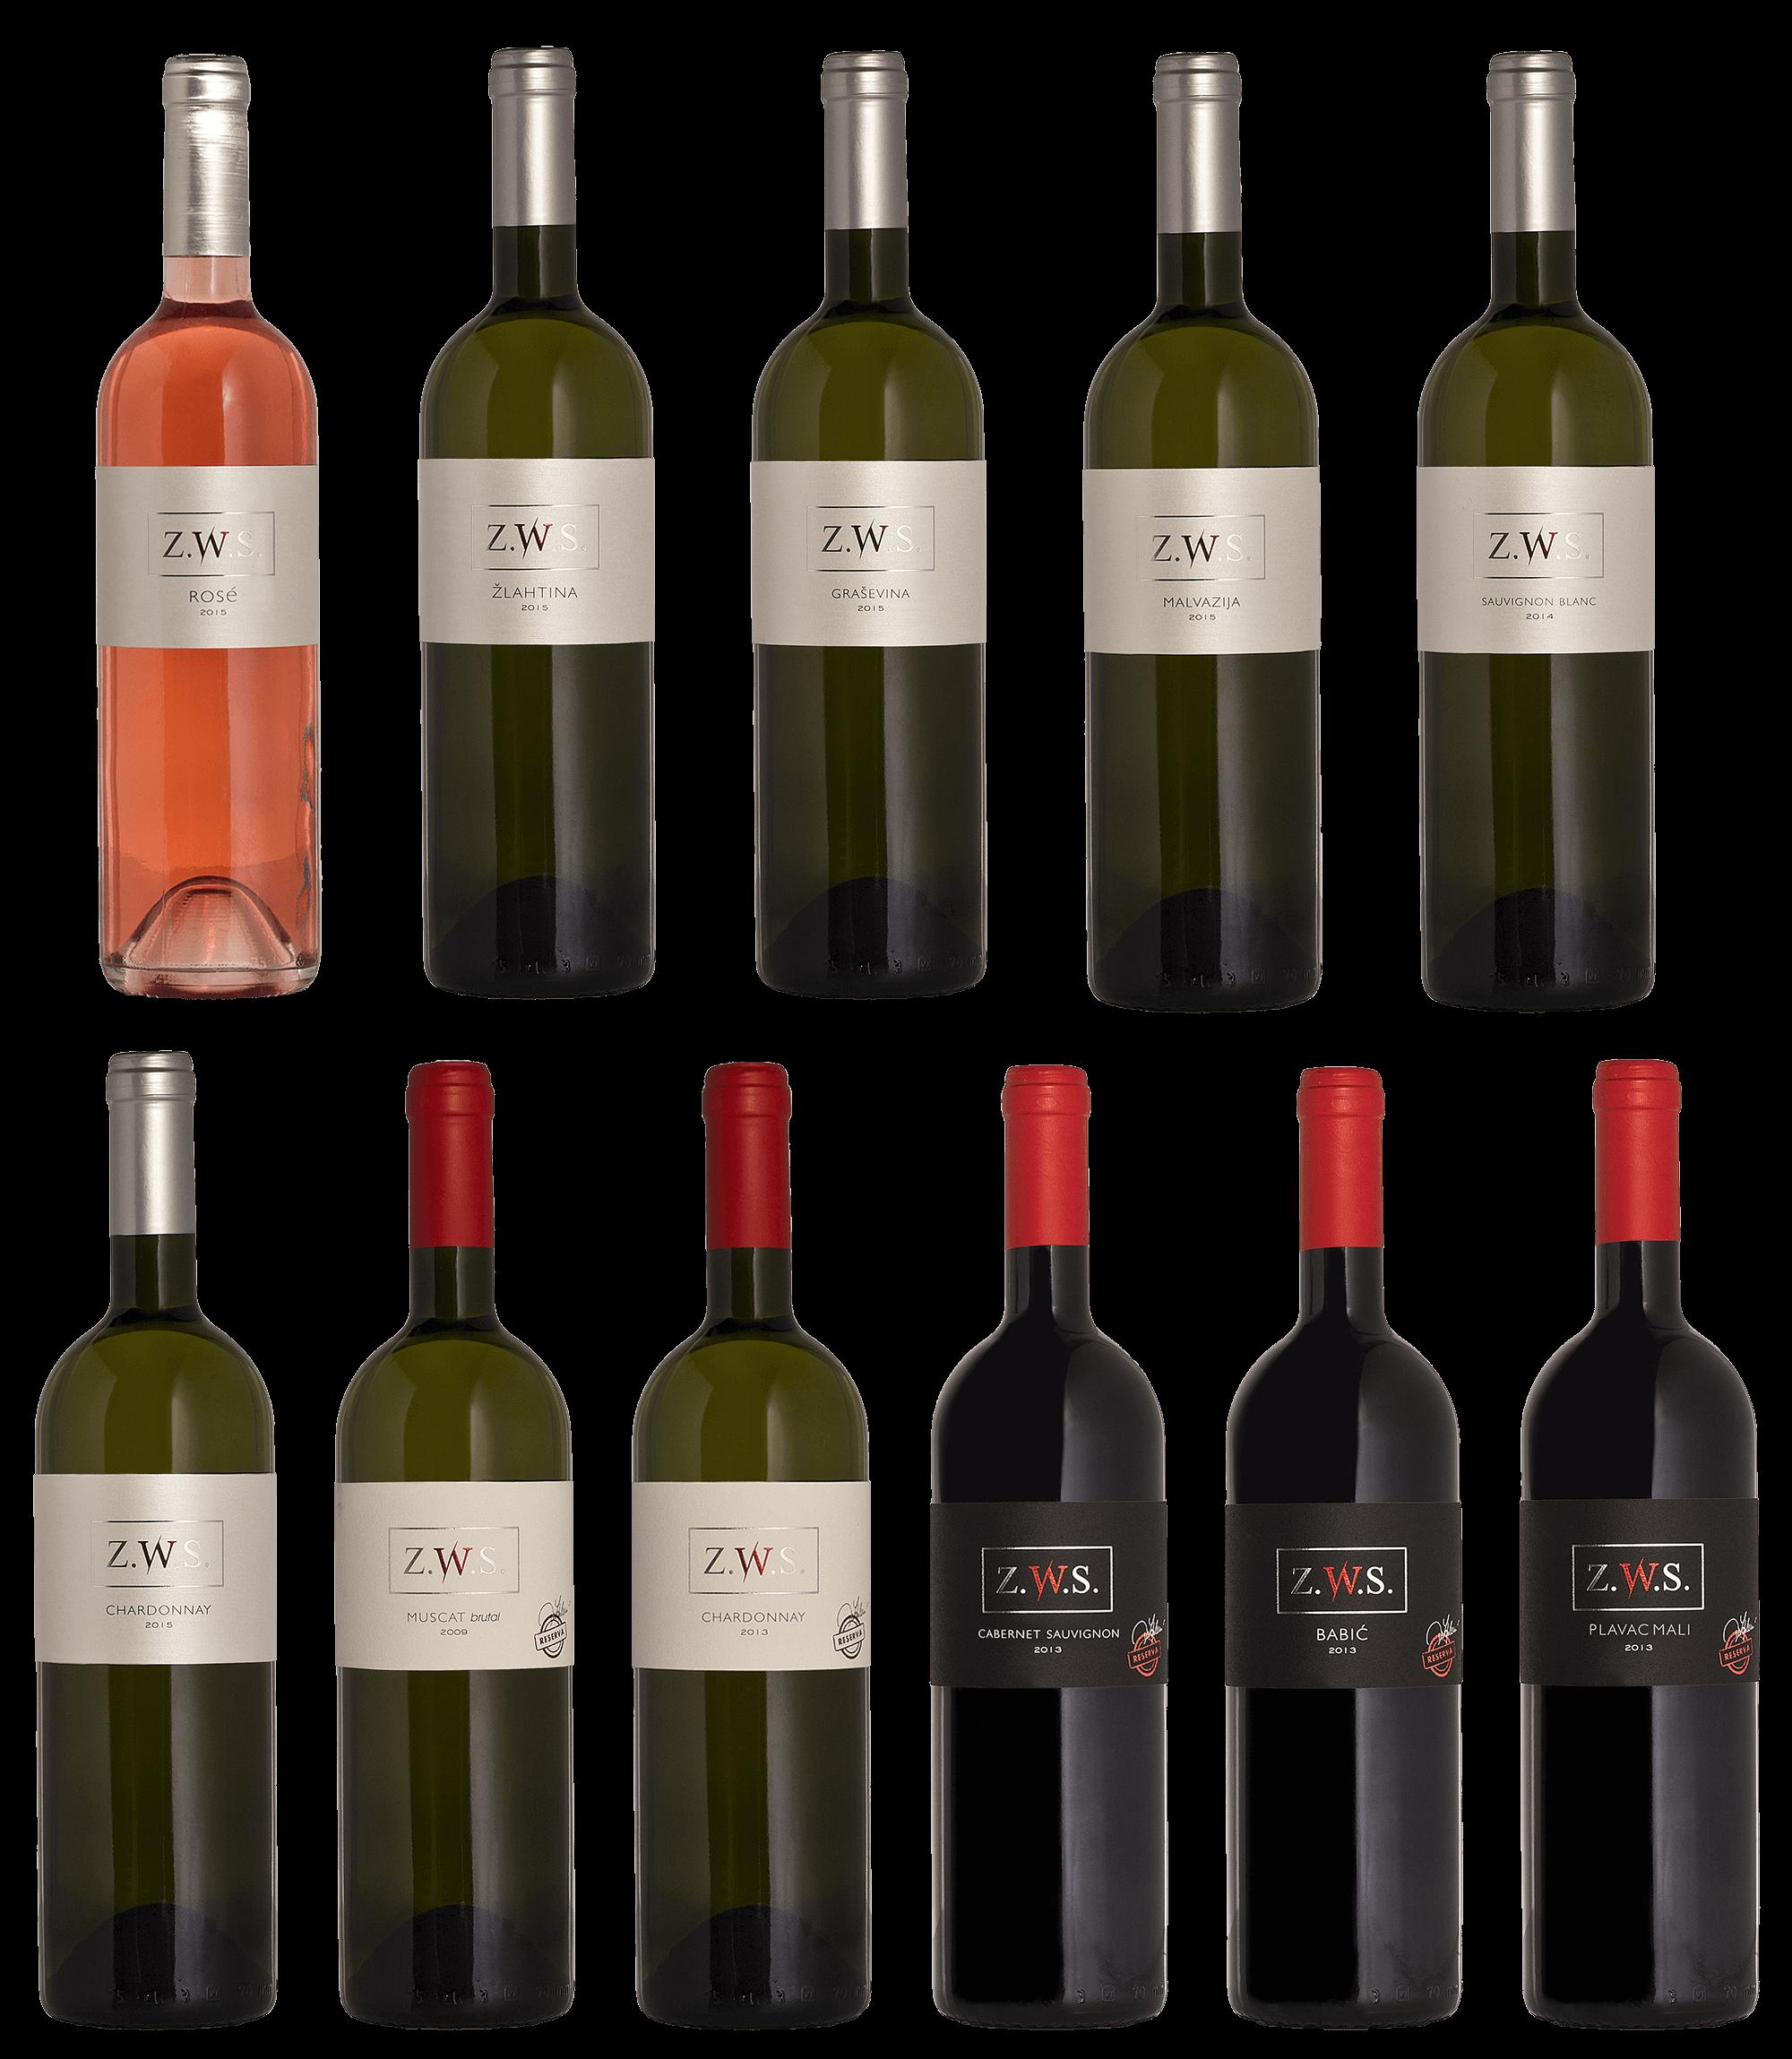 Adventska akcija 15% popusta ZWS vina